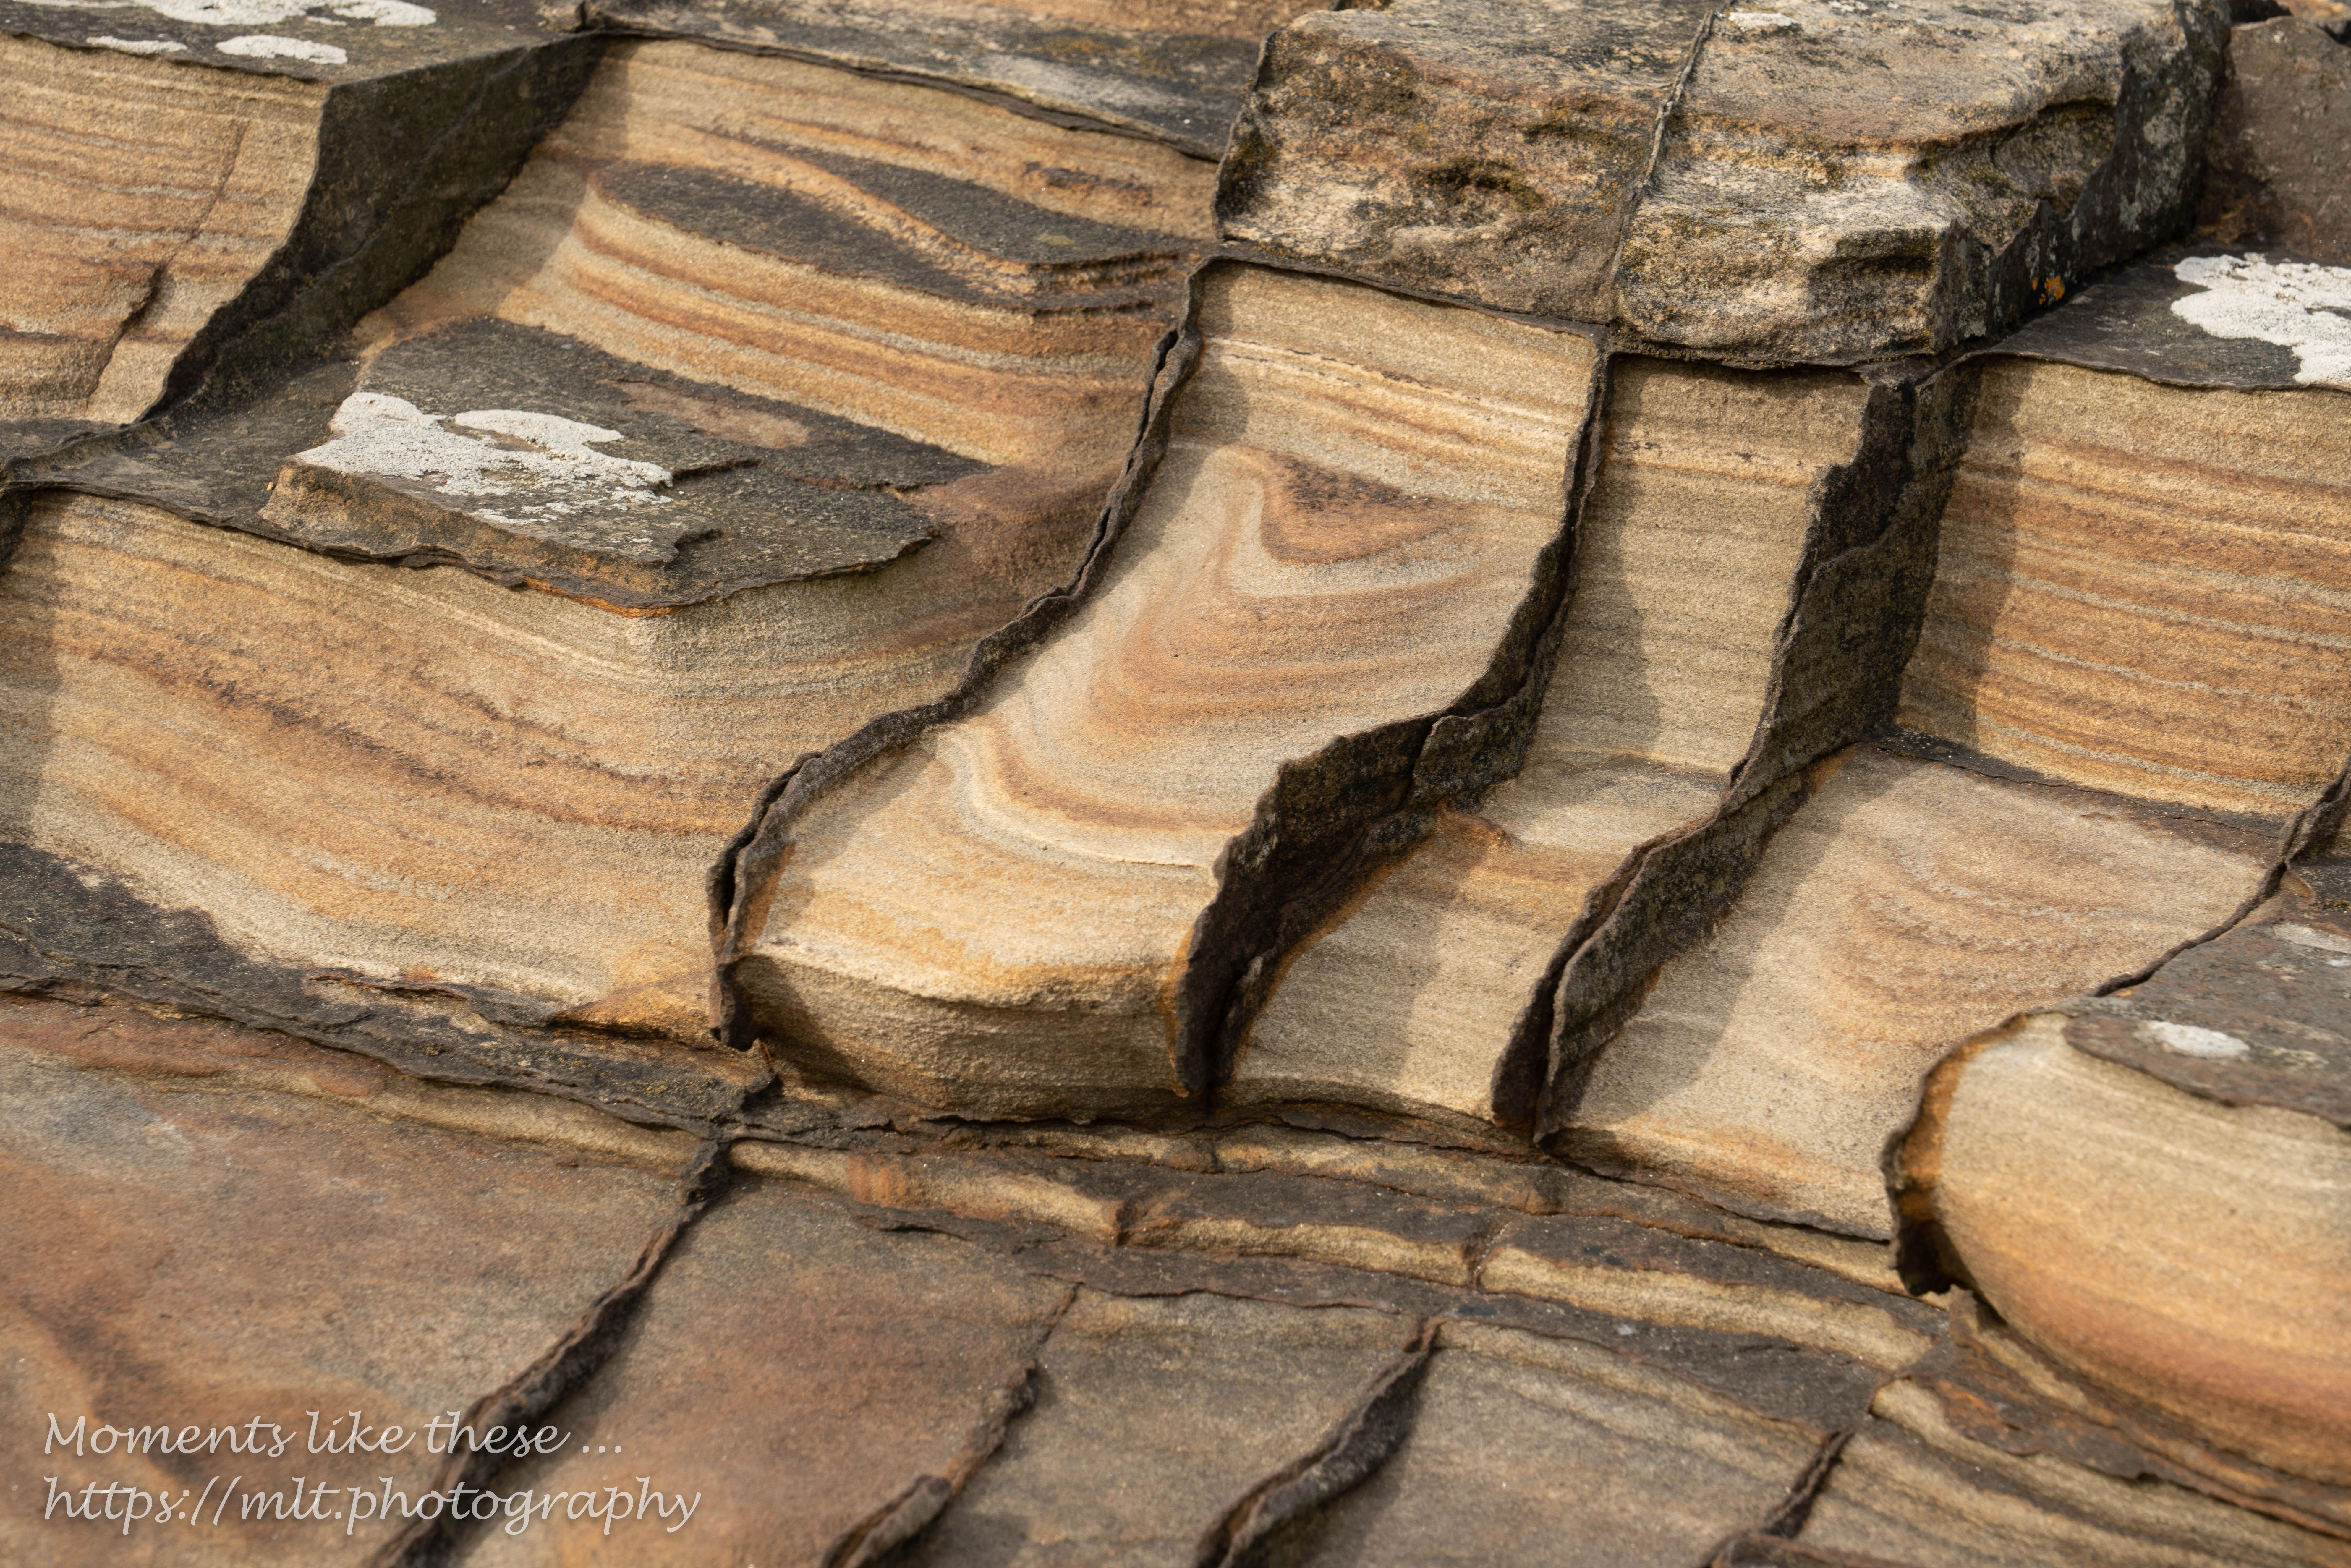 Patterns in sandstone